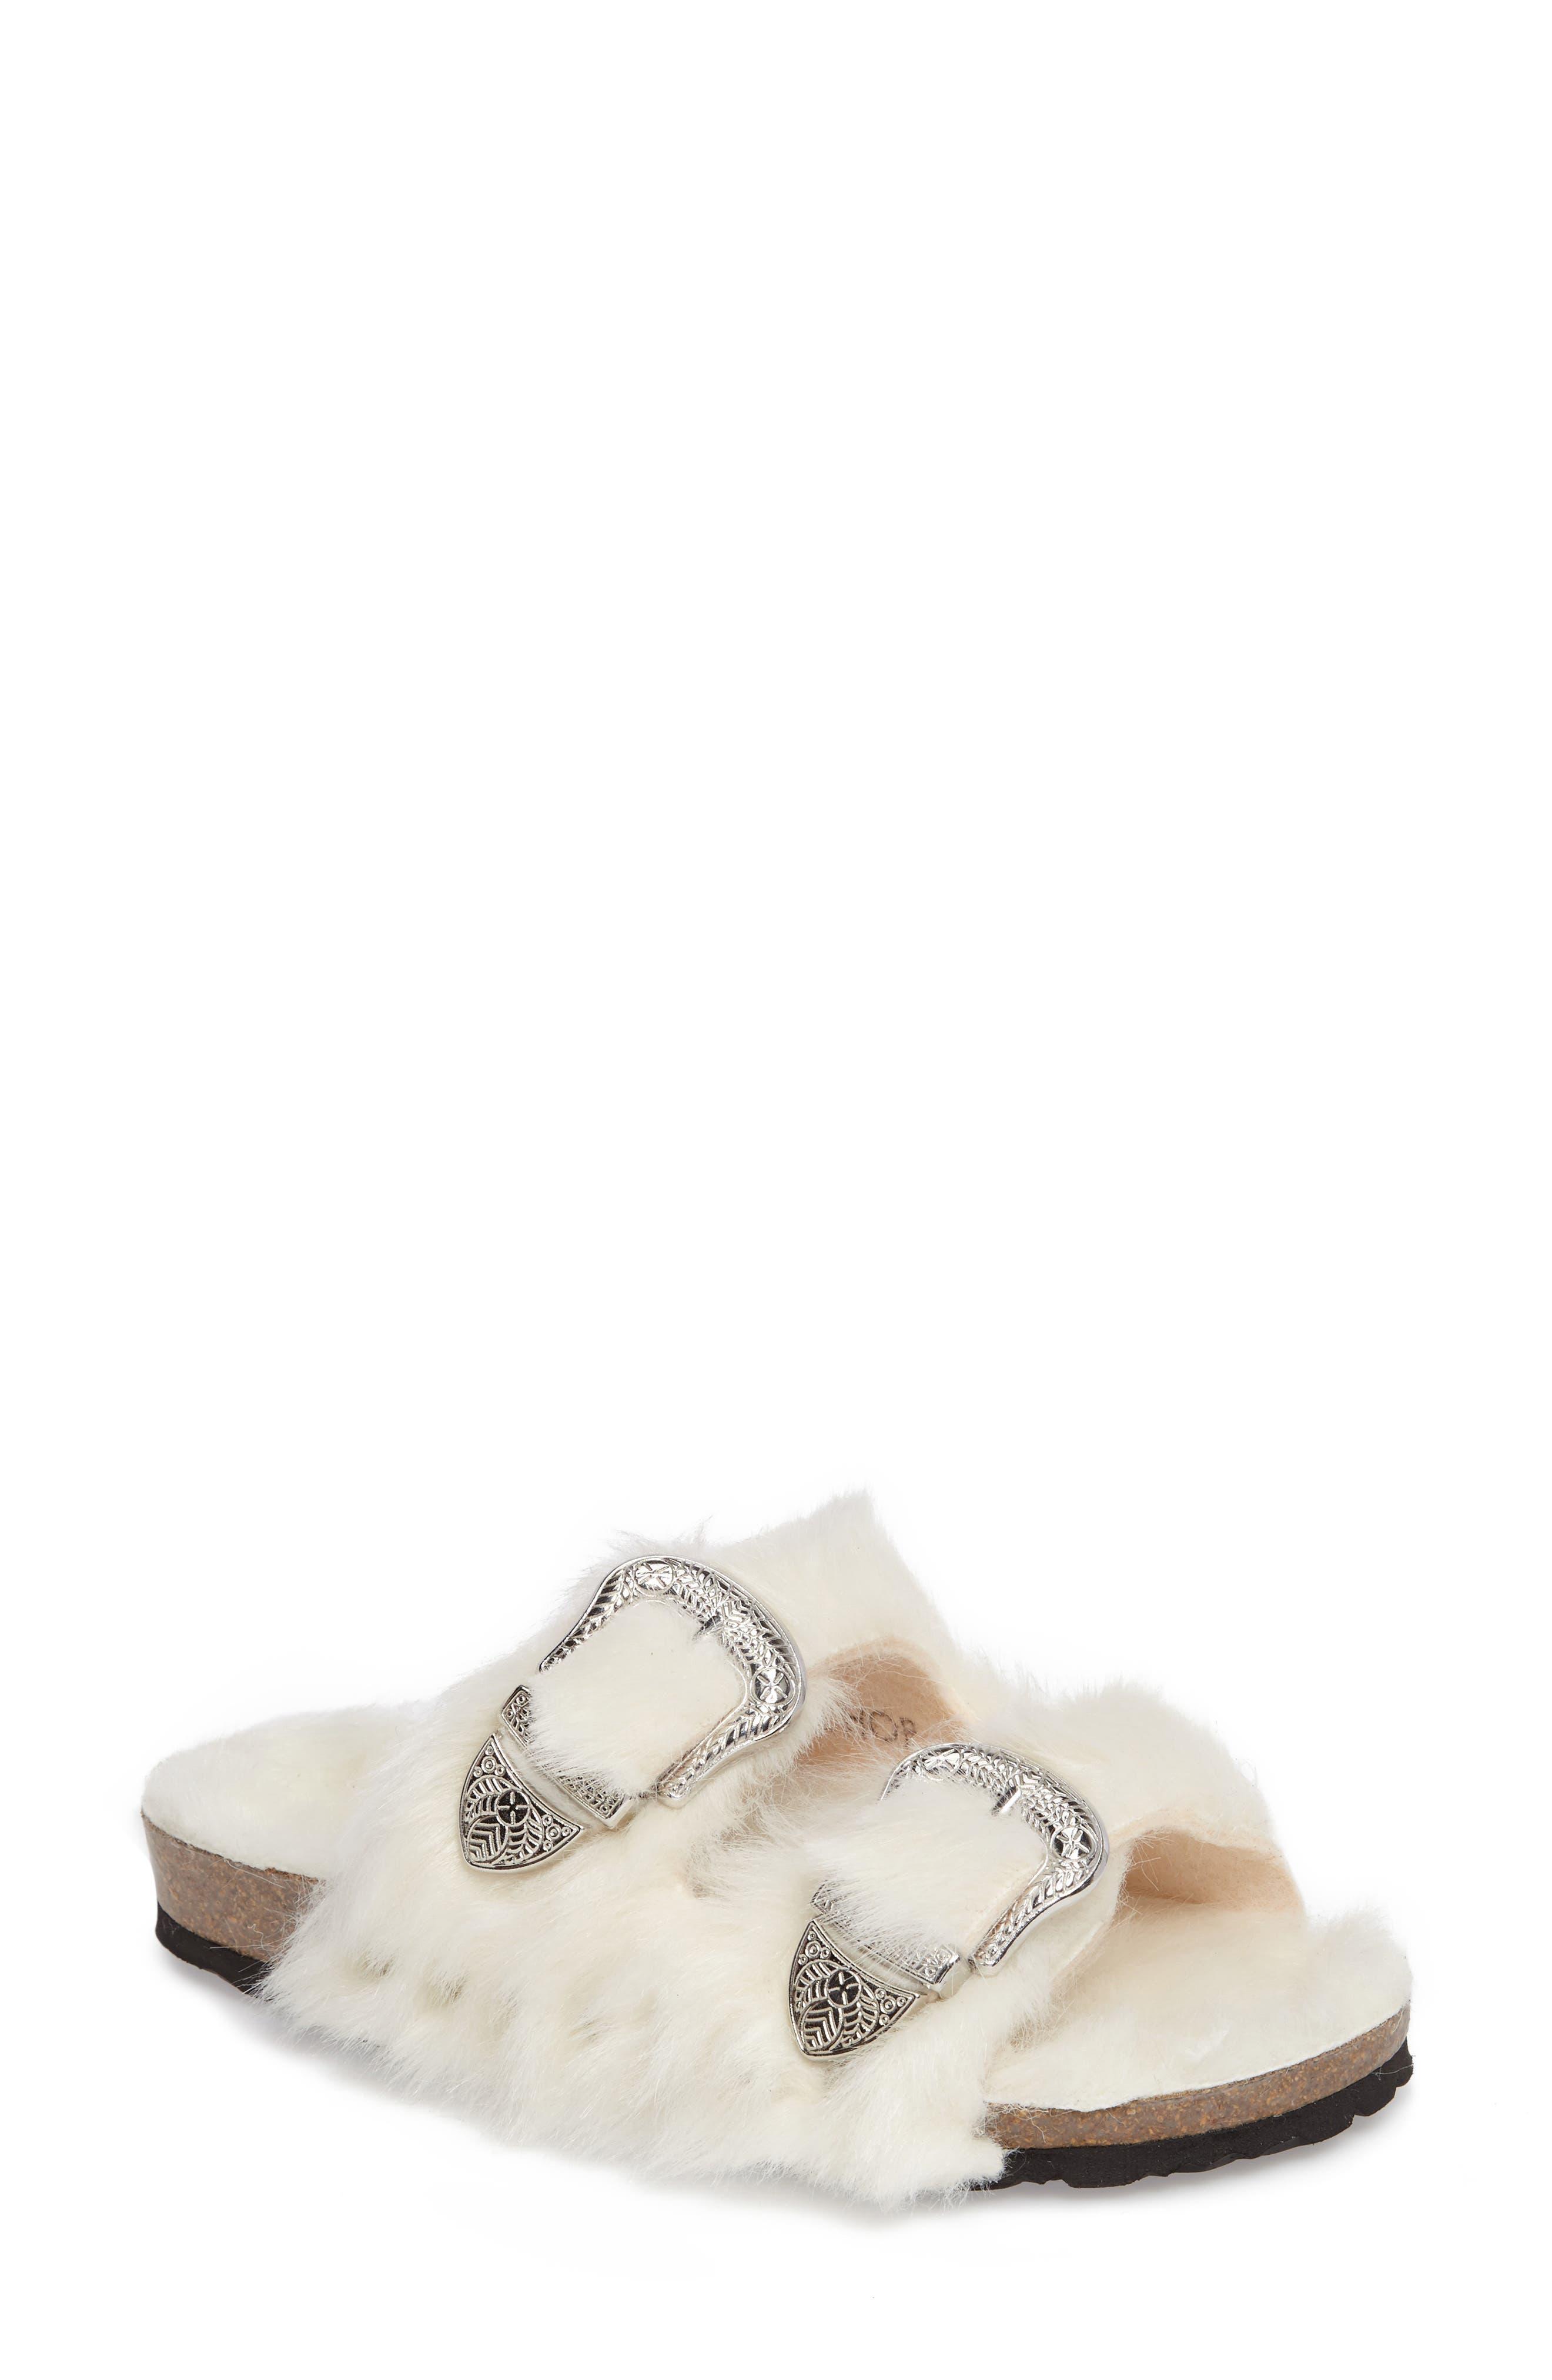 Alternate Image 1 Selected - Topshop Falcon Faux Fur Slide Sandal (Women)